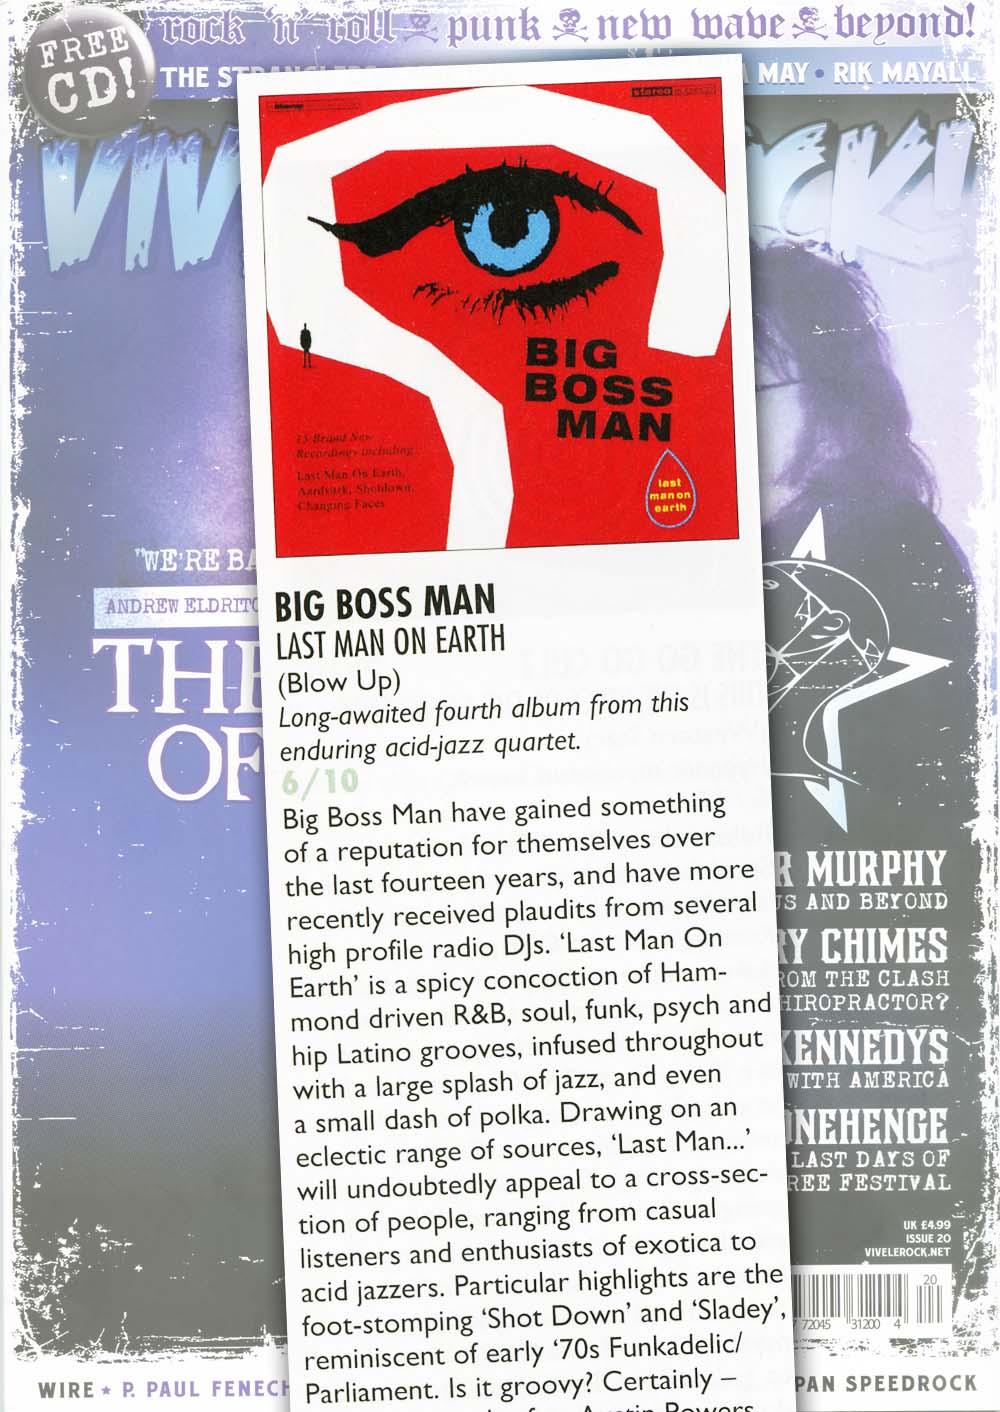 Vive Le Rock Last Man On Earth Album Review Big Boss Man